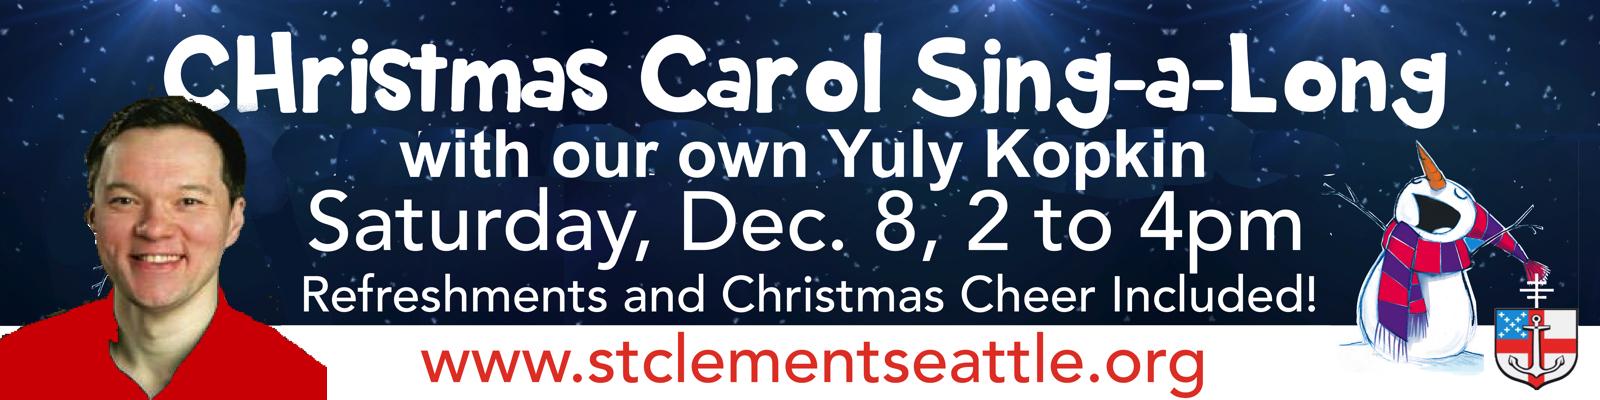 Christmas Carol Singalong Yuli.jpg